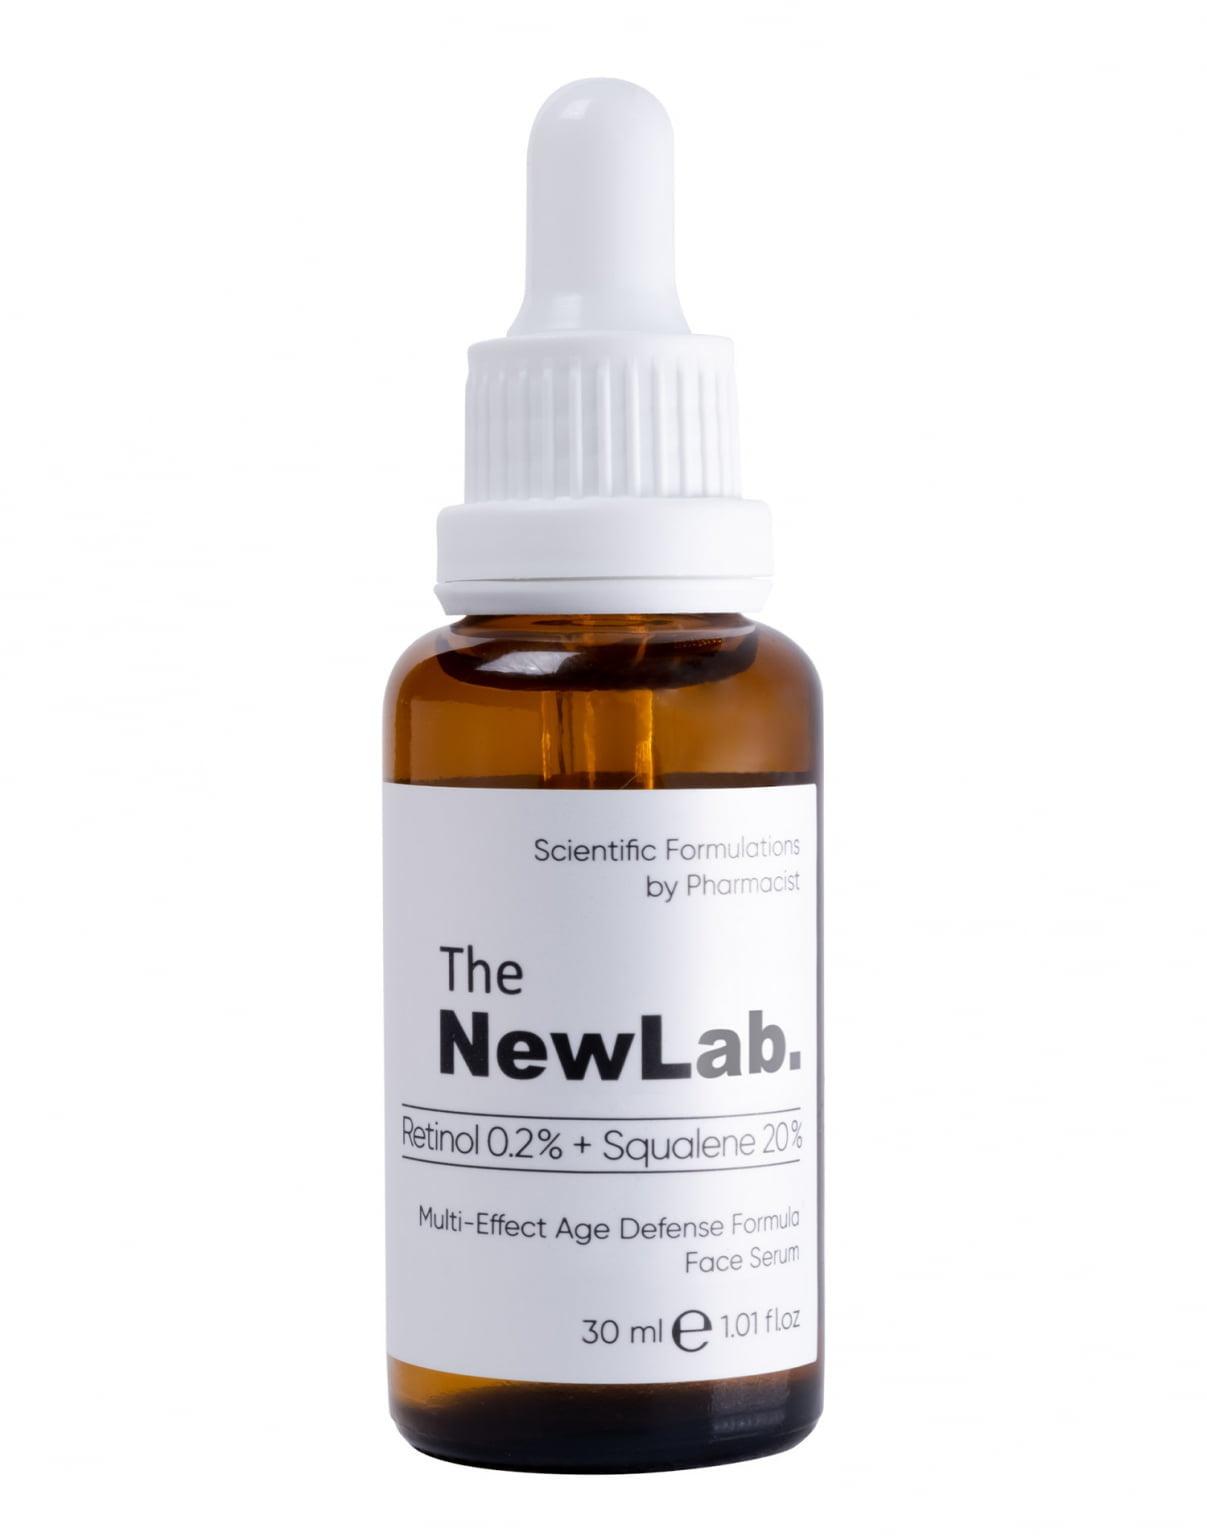 the NewLab. Multi-Effect Age Defense Formula Face Serum